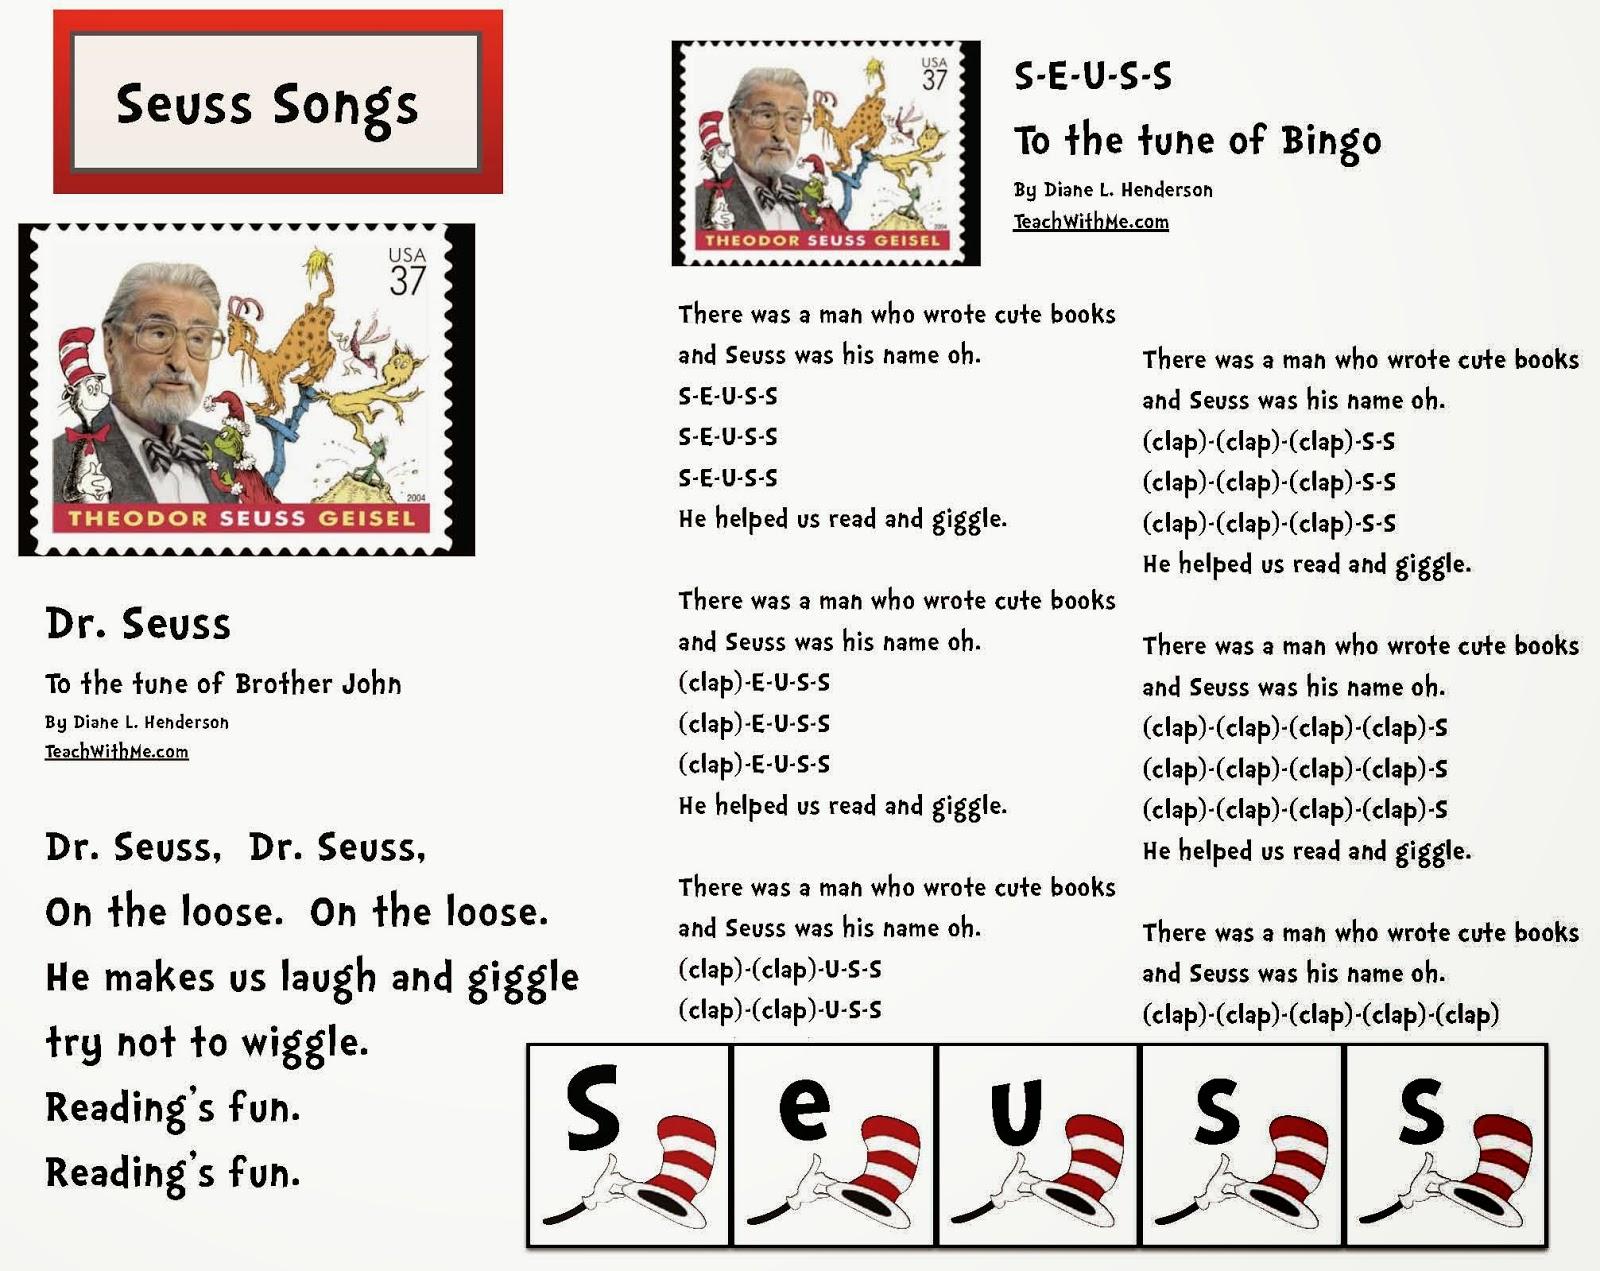 doctor song for preschool classroom freebies dr seuss activities songs for seuss 690